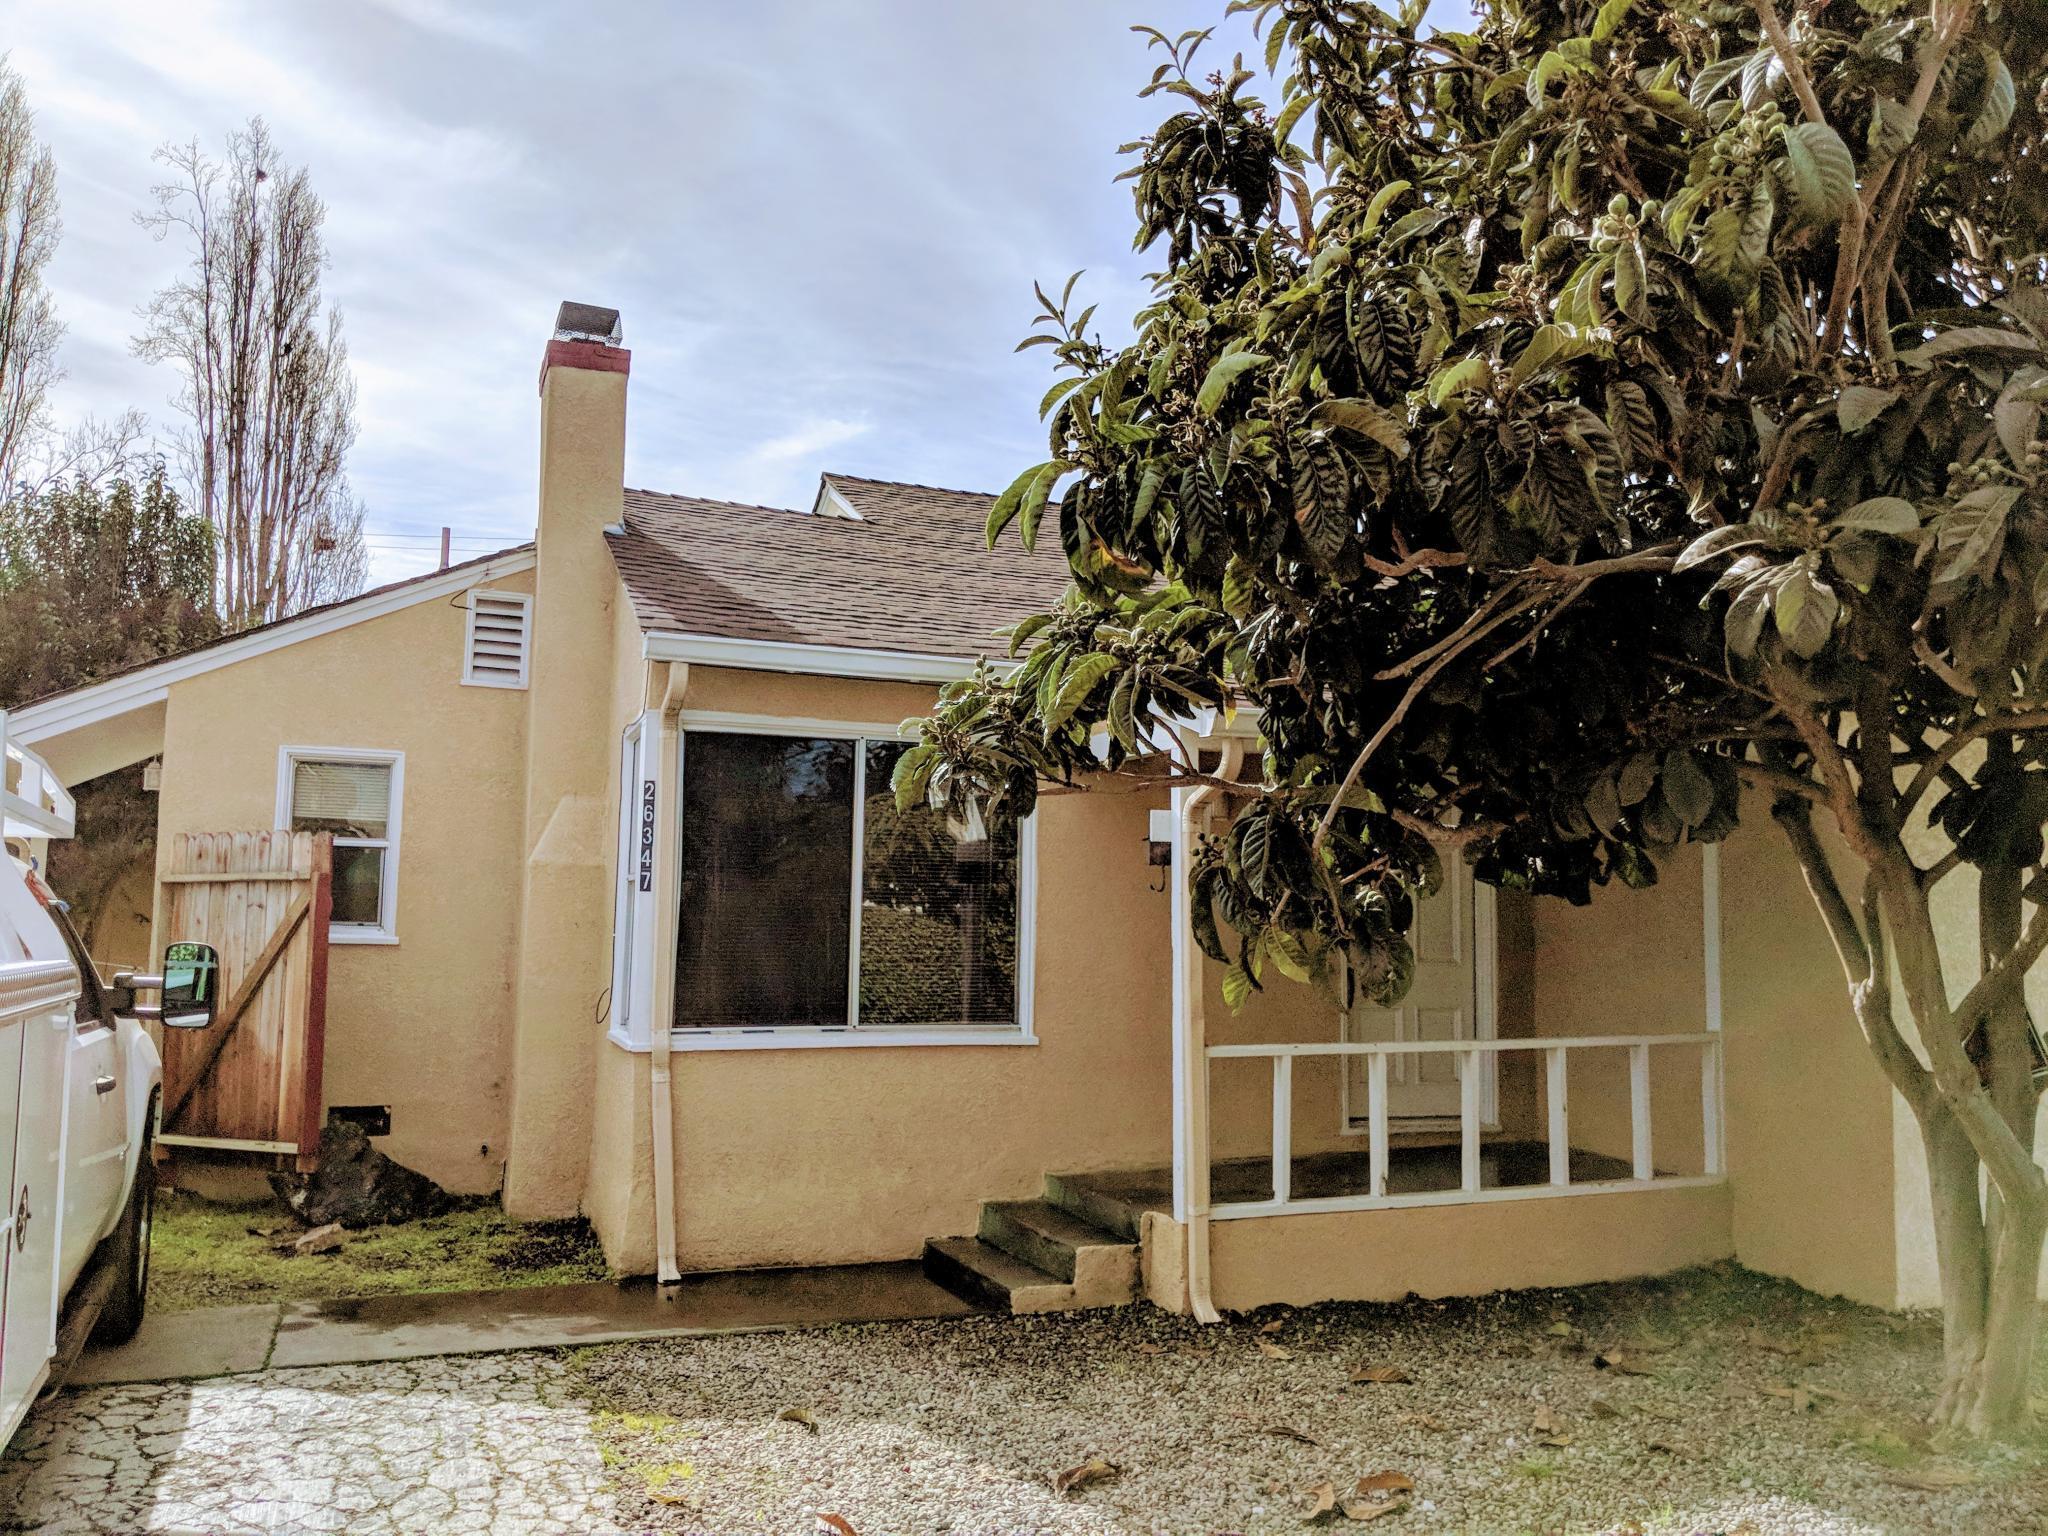 26347 Gading Rd, Hayward, CA 94544 For Rent | Trulia